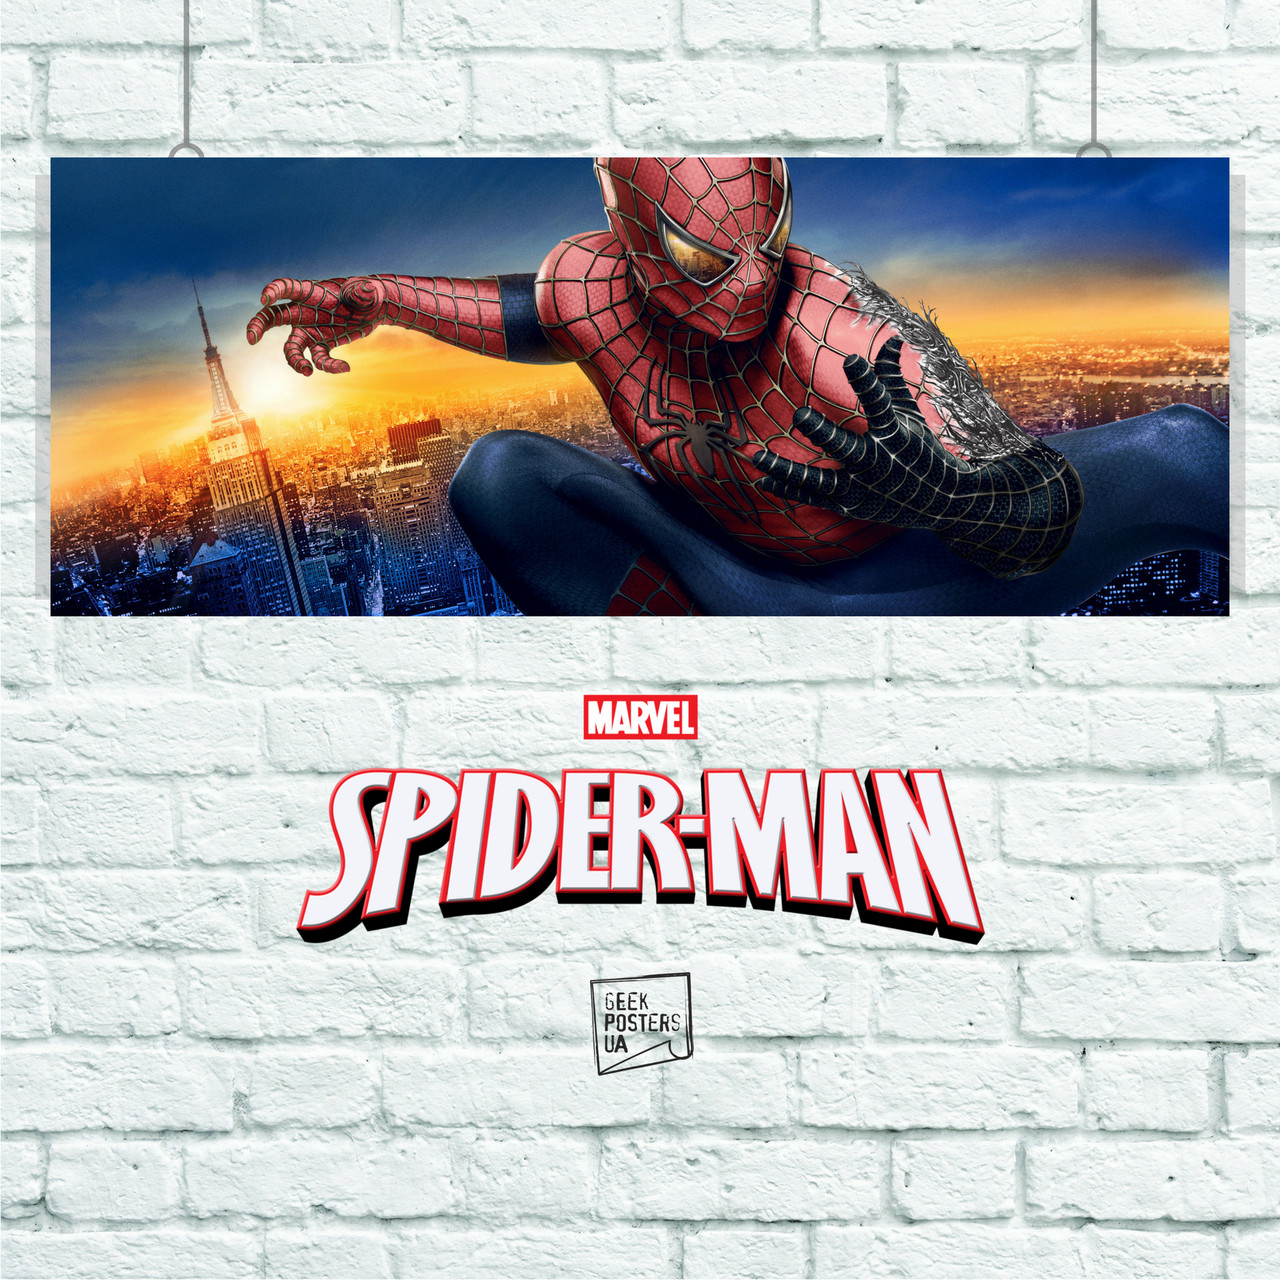 Постер Spider-Man 3, Человек-паук, Спайдермен. Размер 60x23см (A2). Глянцевая бумага